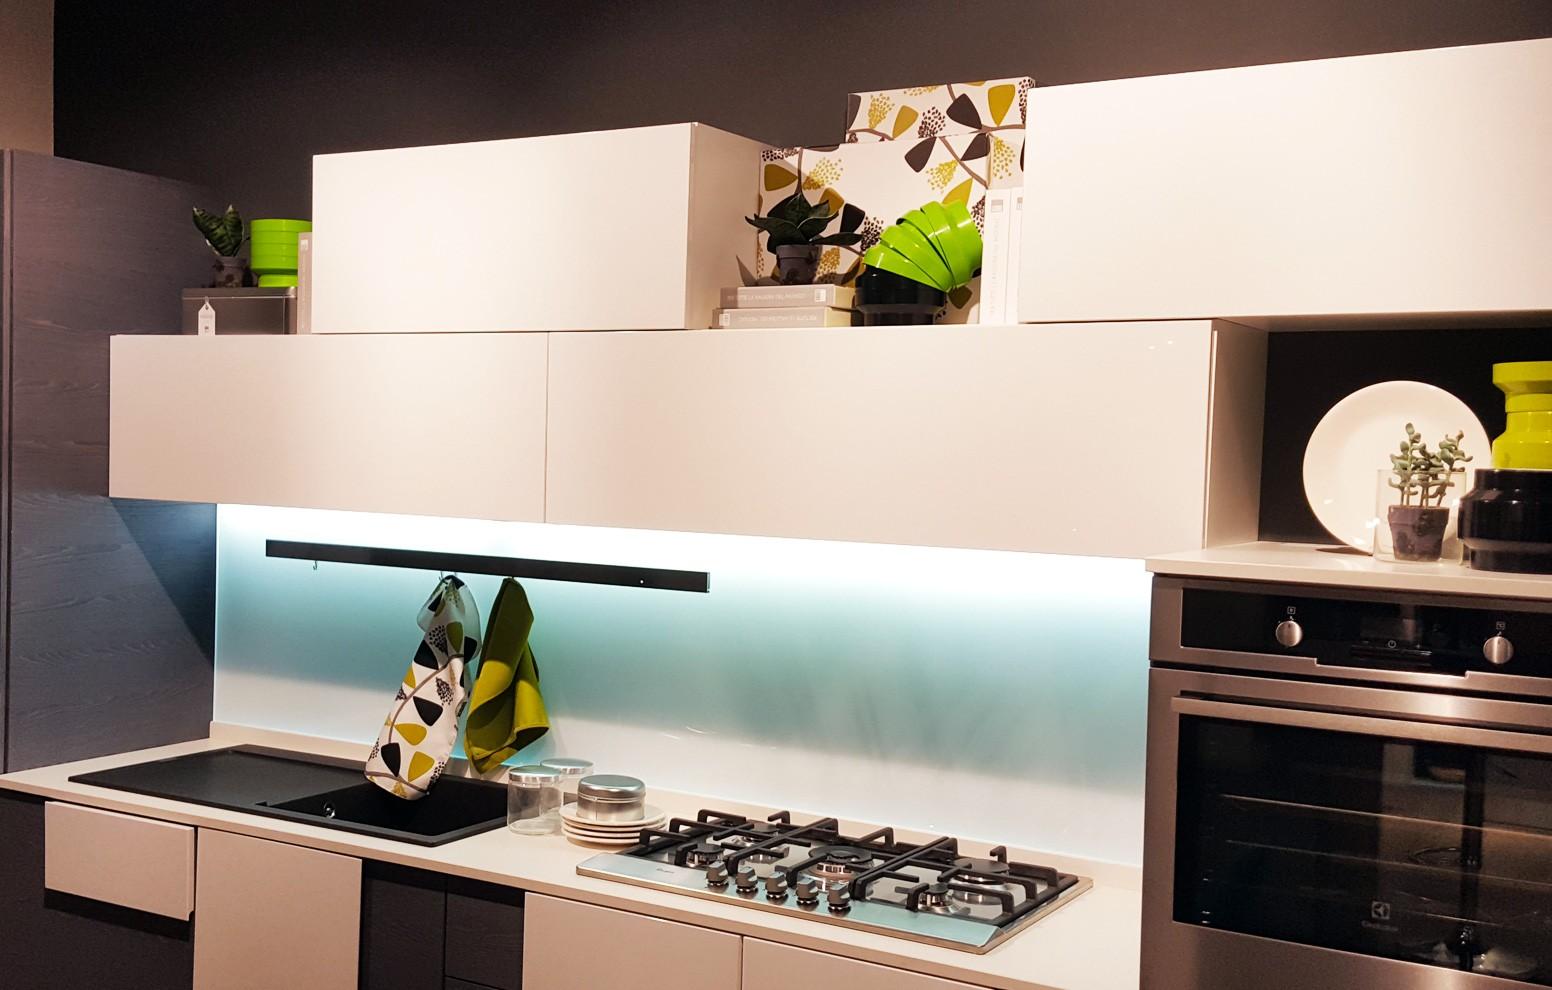 5 Regole Base Per Arredare Una Cucina Moderna Pianeta Casa Arredamento Milano